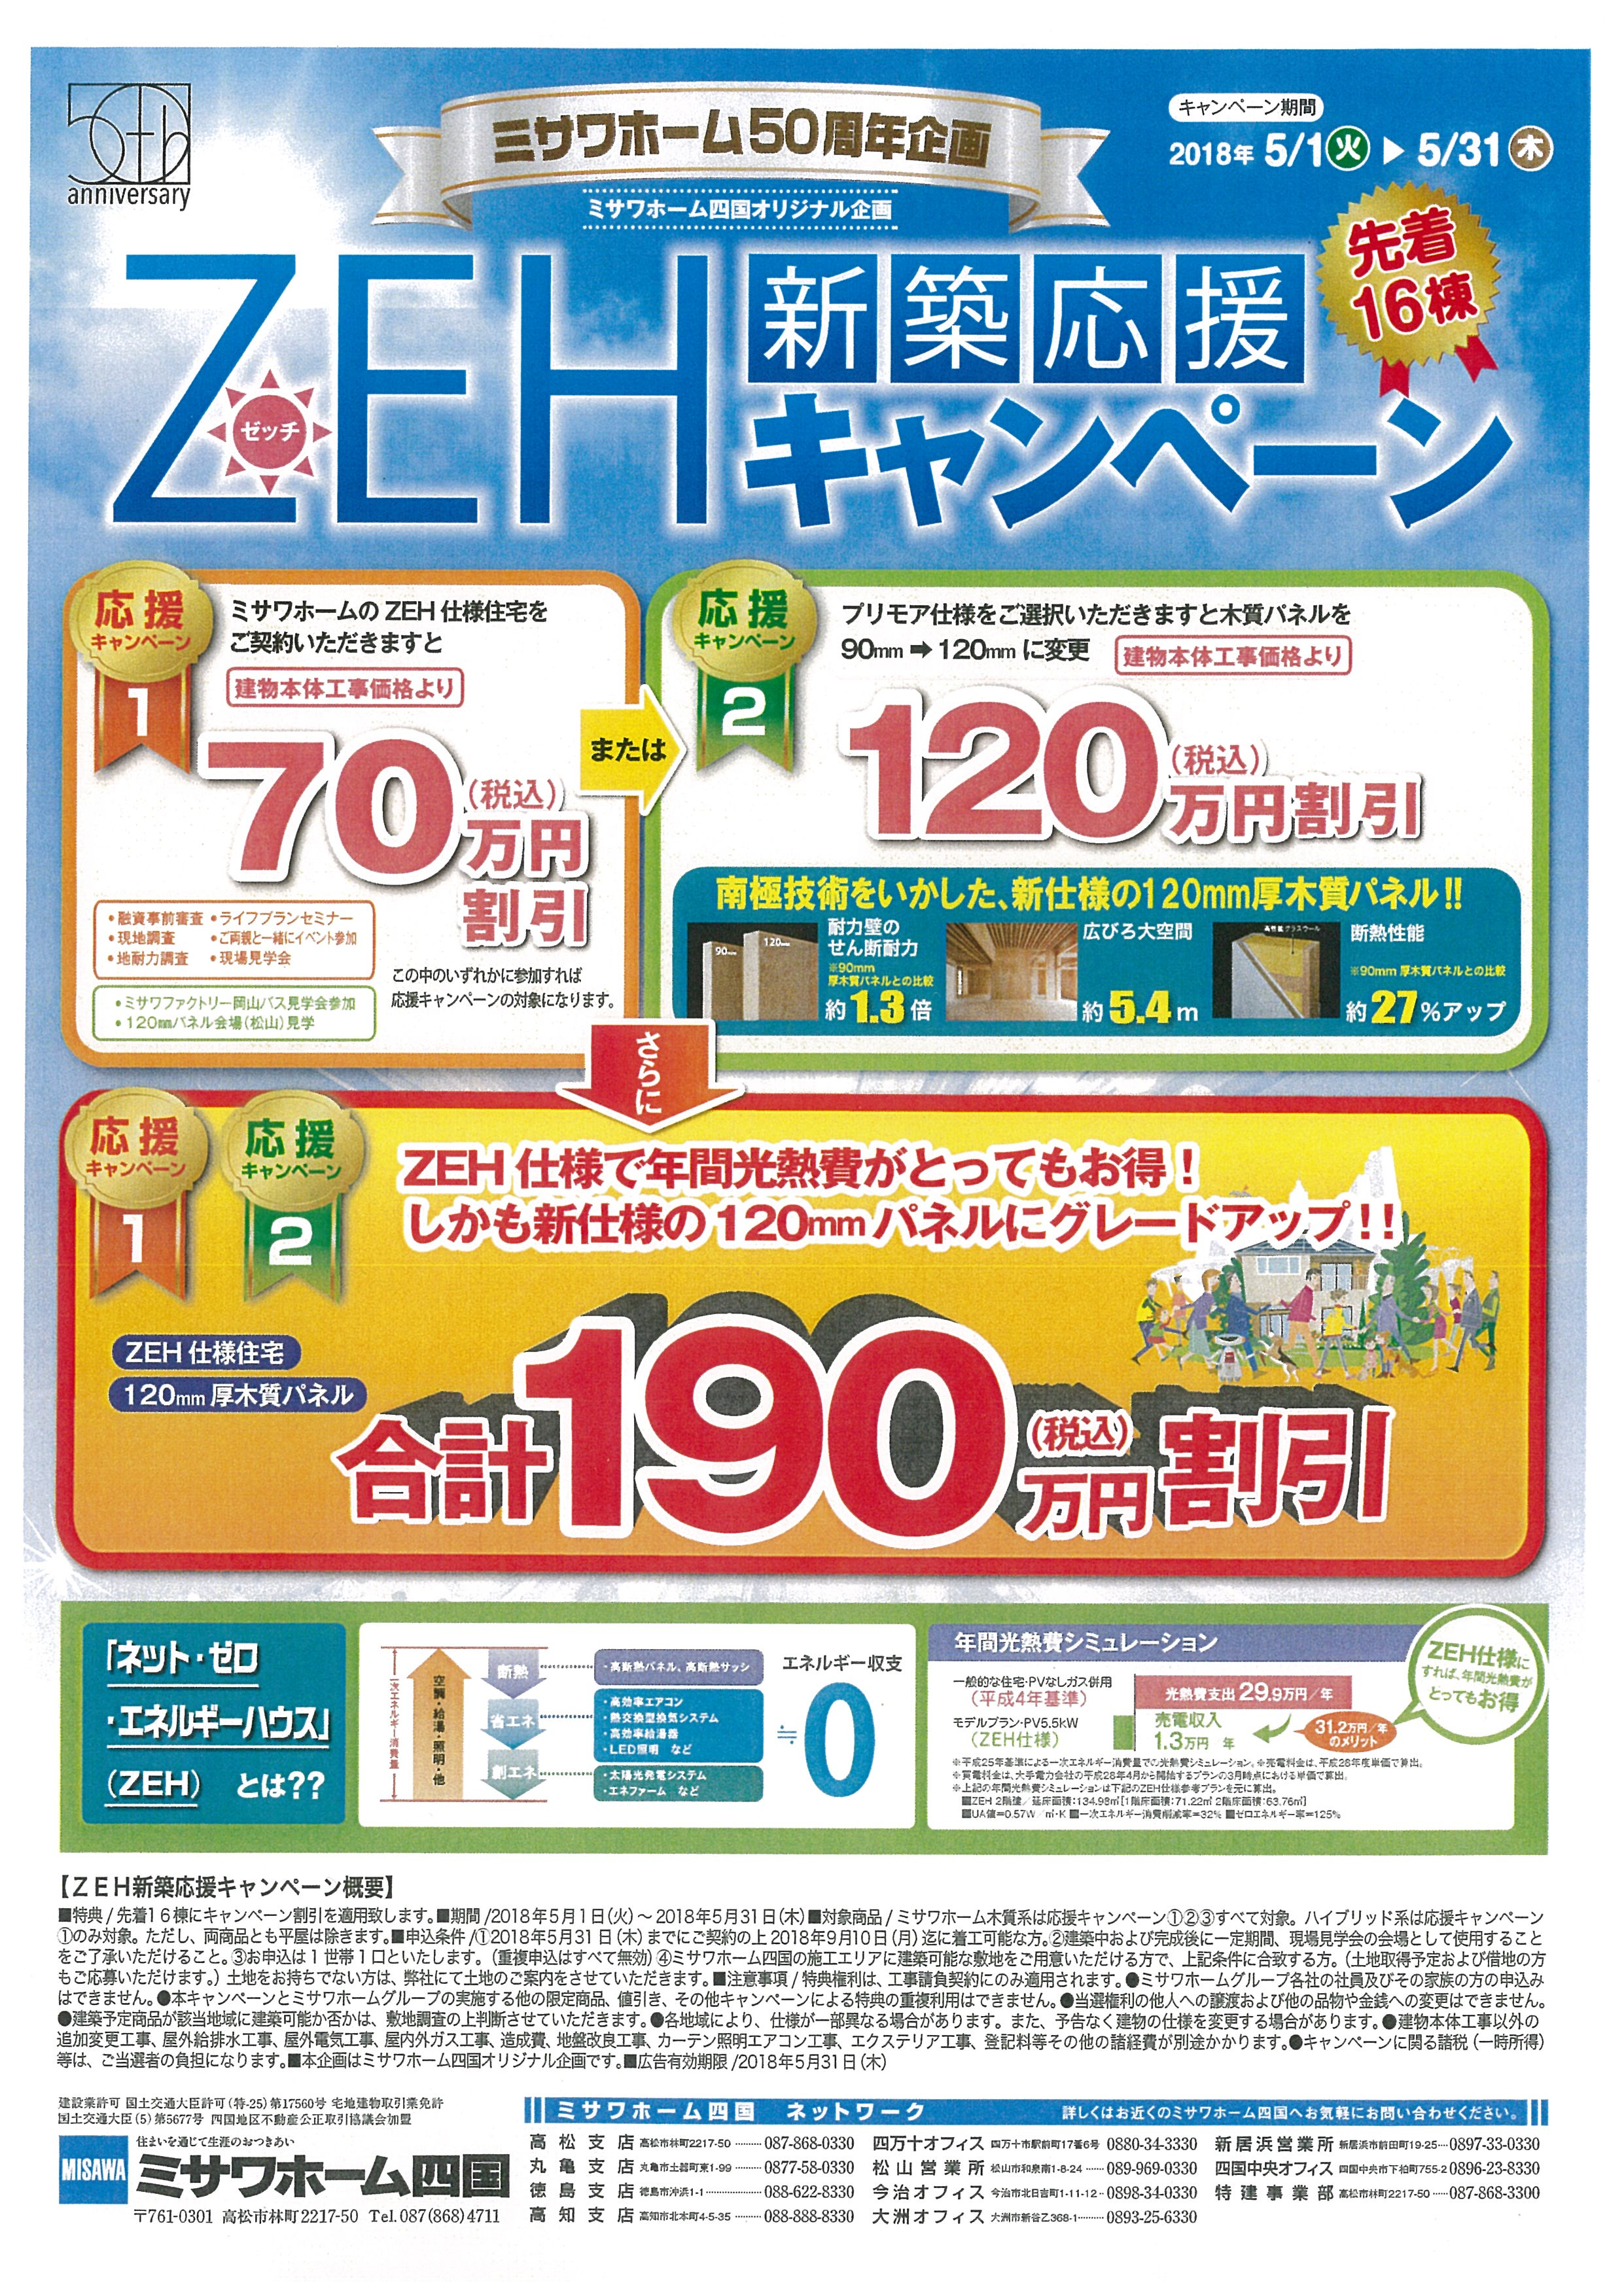 http://shikoku.misawa.co.jp/area_kouchi/%EF%BC%BA%EF%BC%A5%EF%BC%A8.jpg